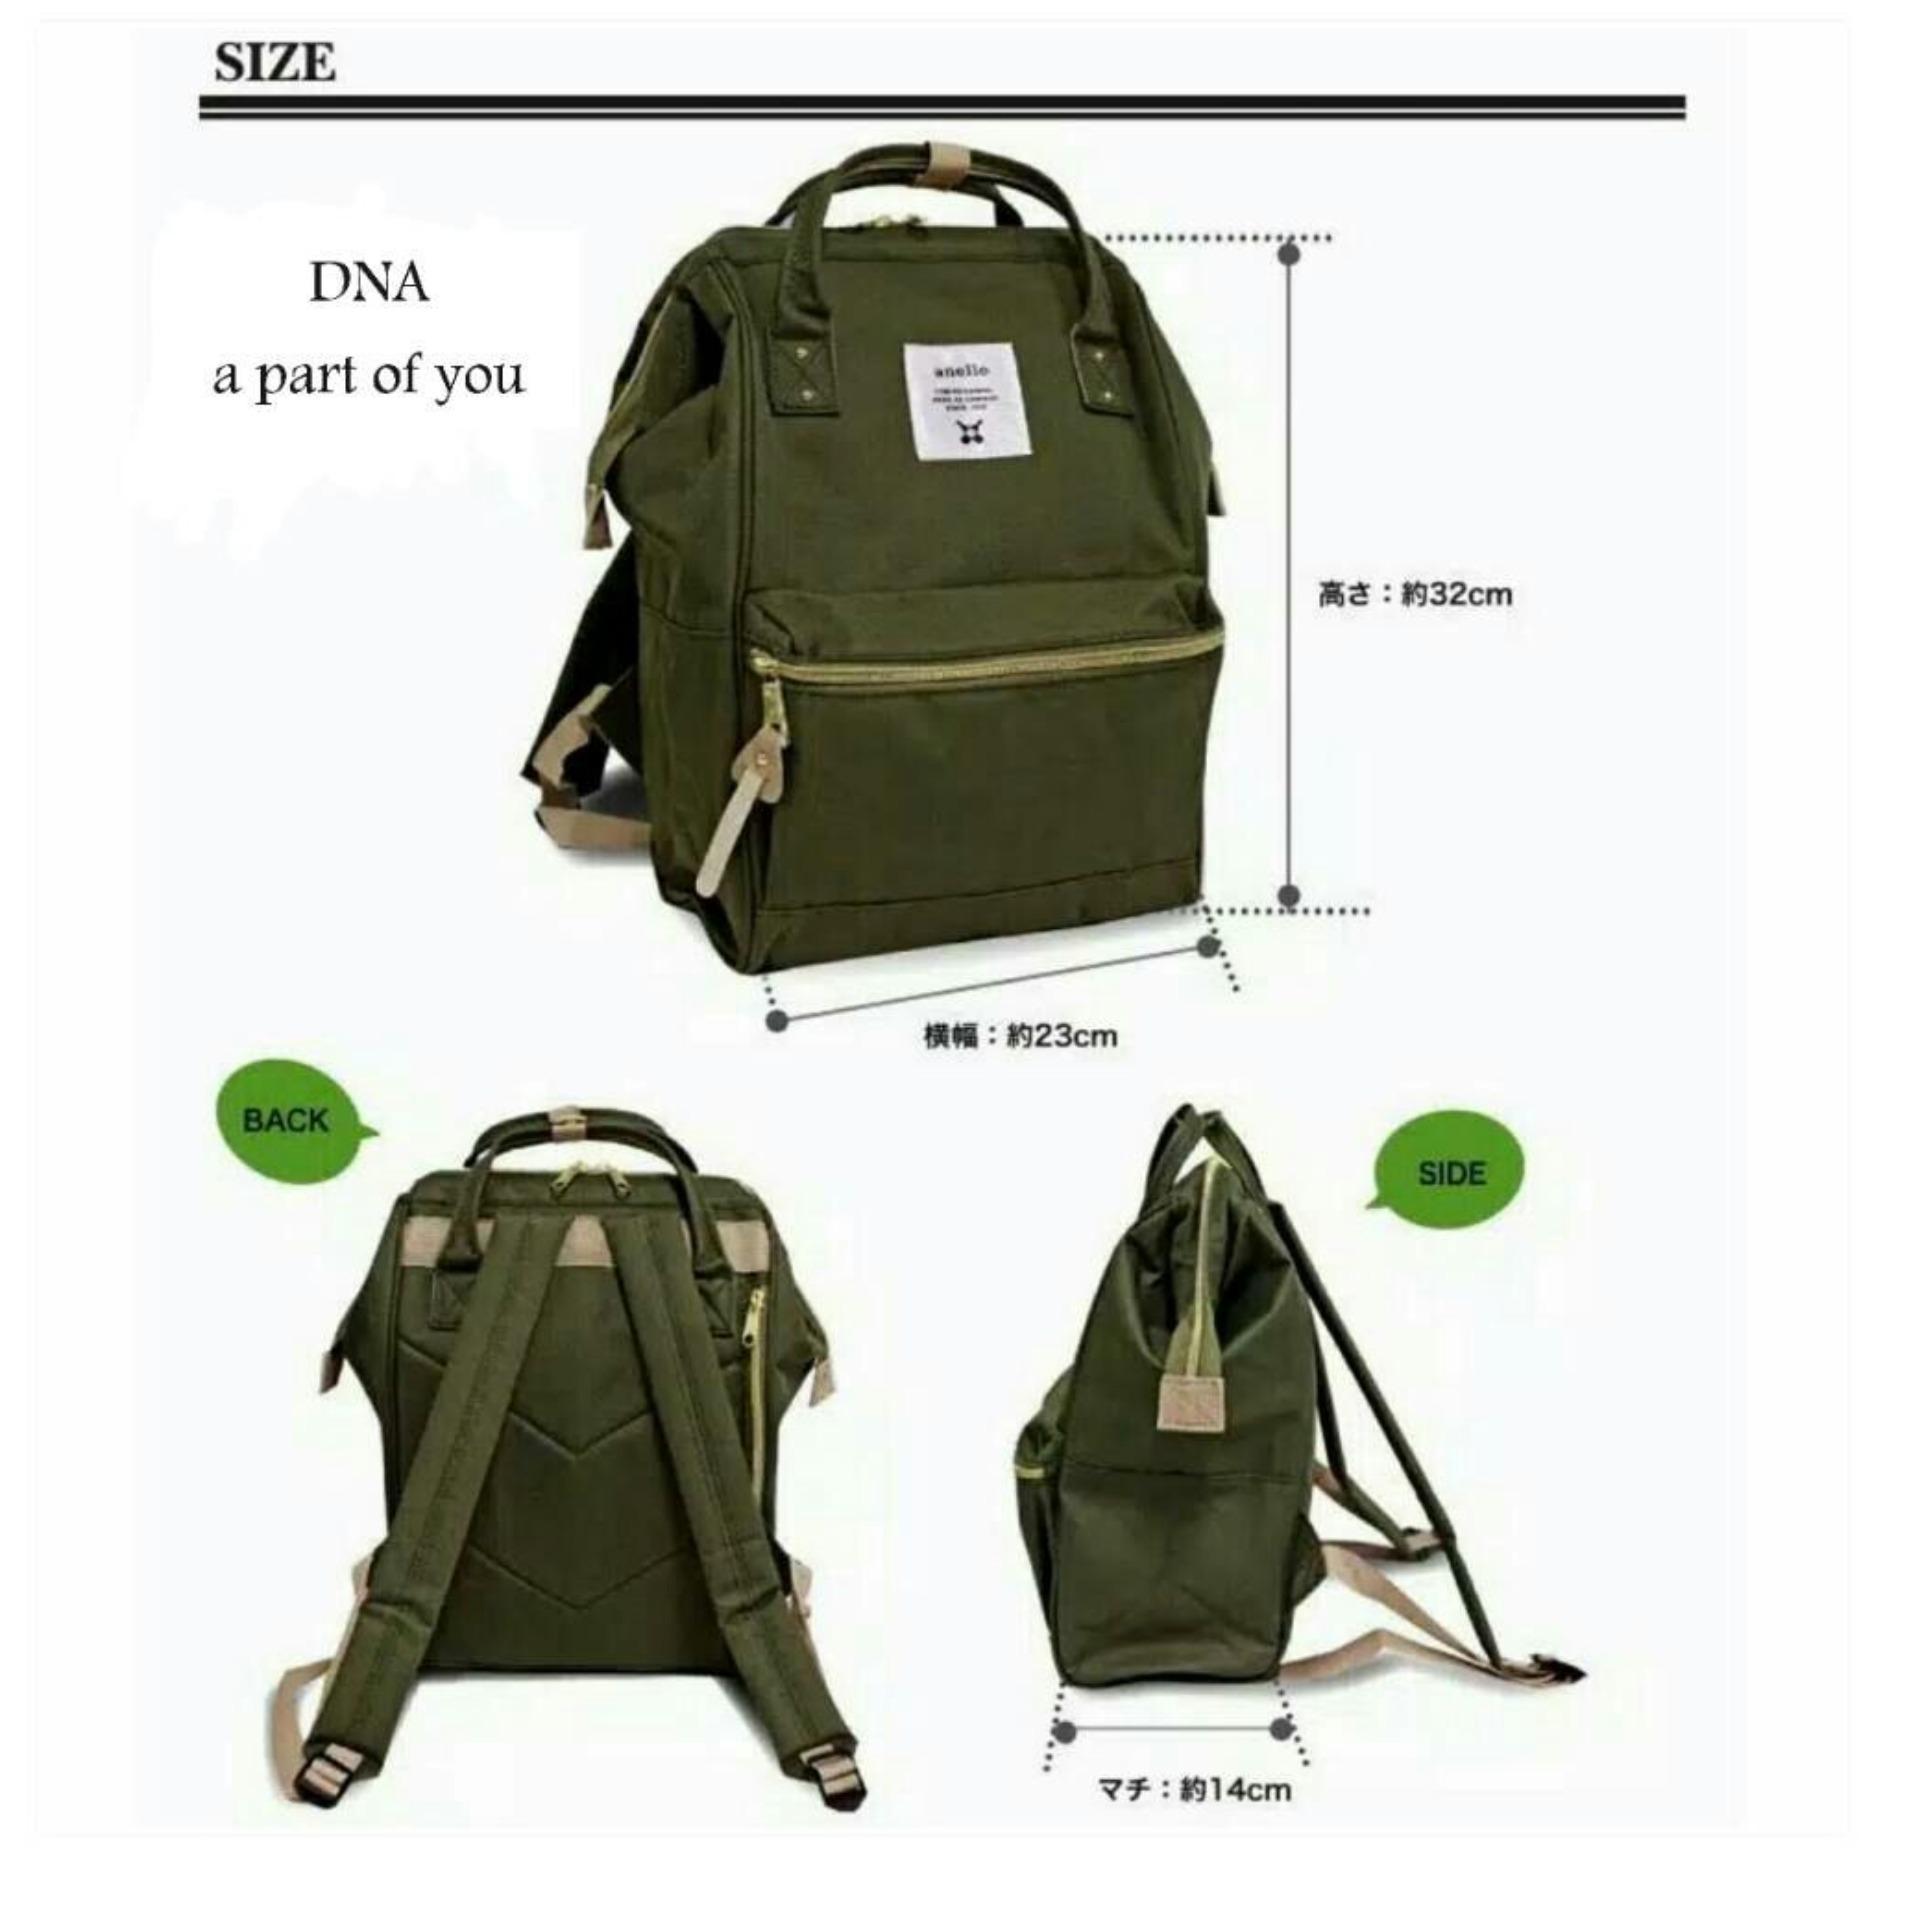 Anello HD Nylon Backpack Tas Ransel Casual Multifungsi